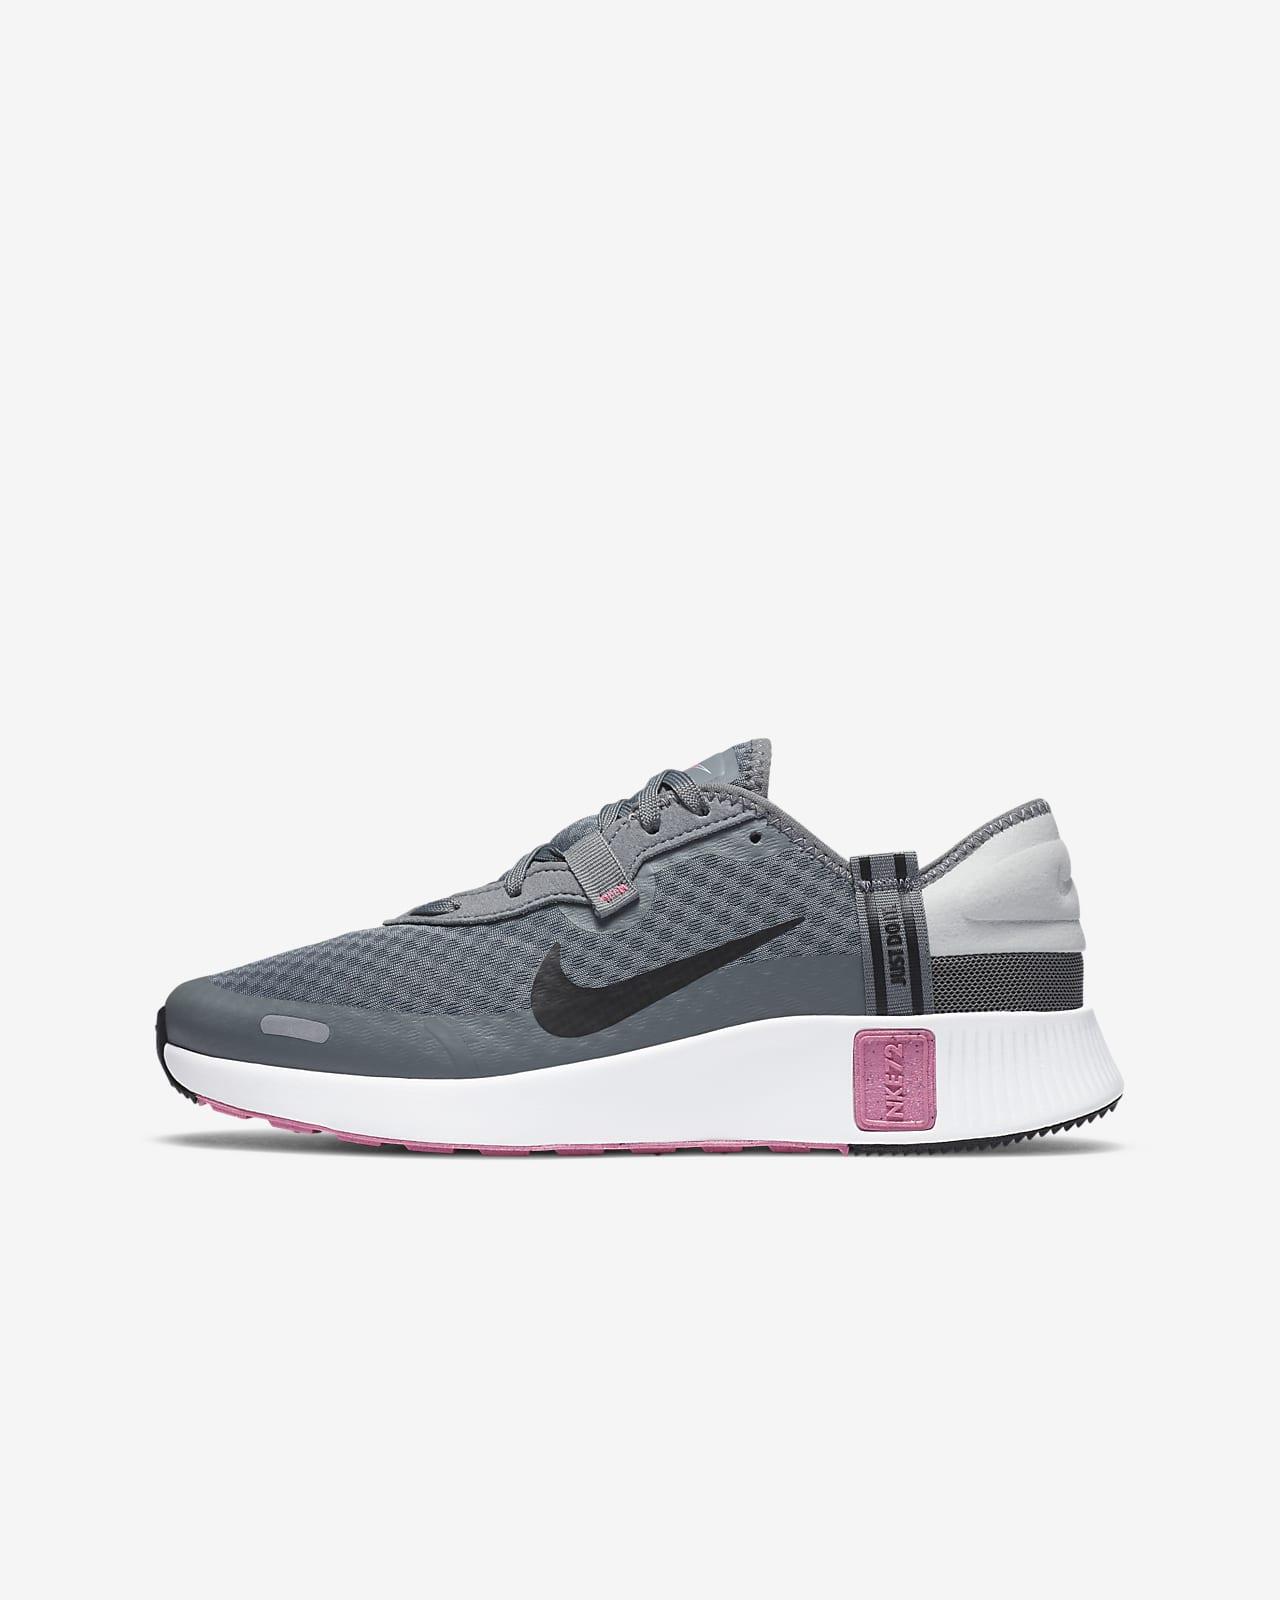 Nike Reposto Genç Çocuk Ayakkabısı